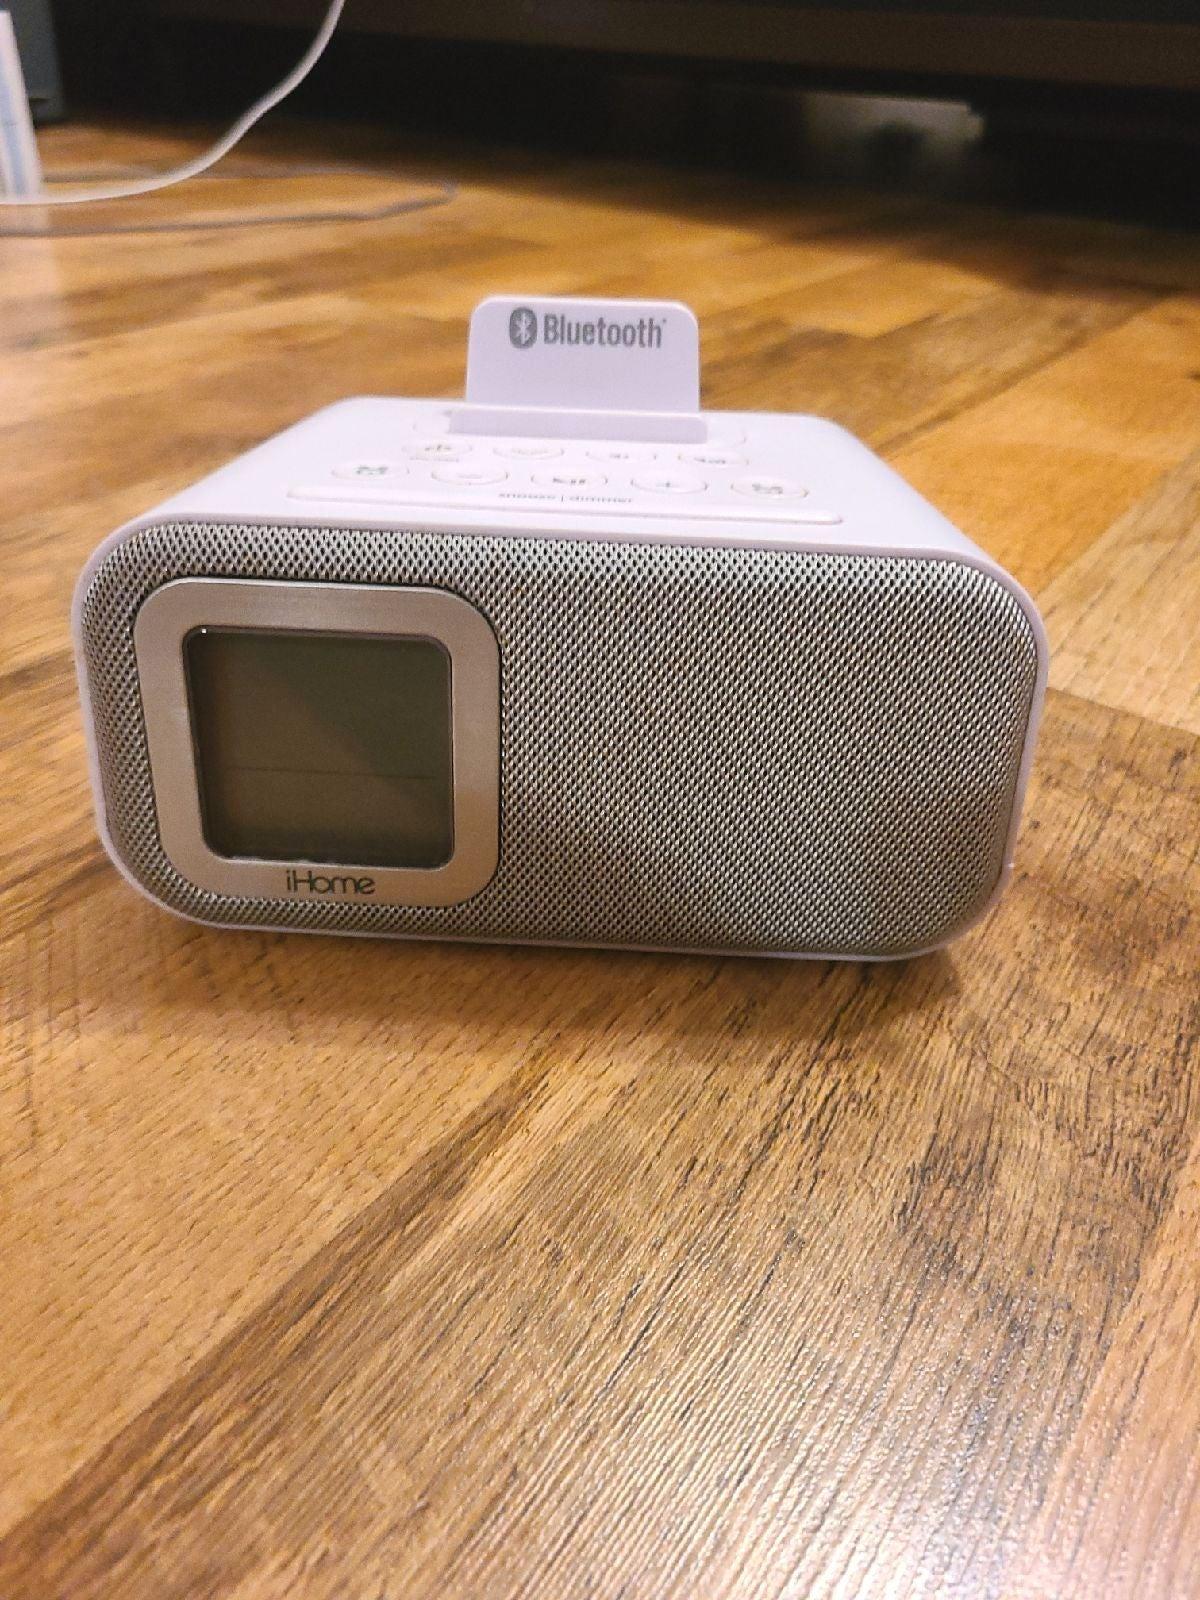 iHome Bluetooth Speaker and Alarm Clock